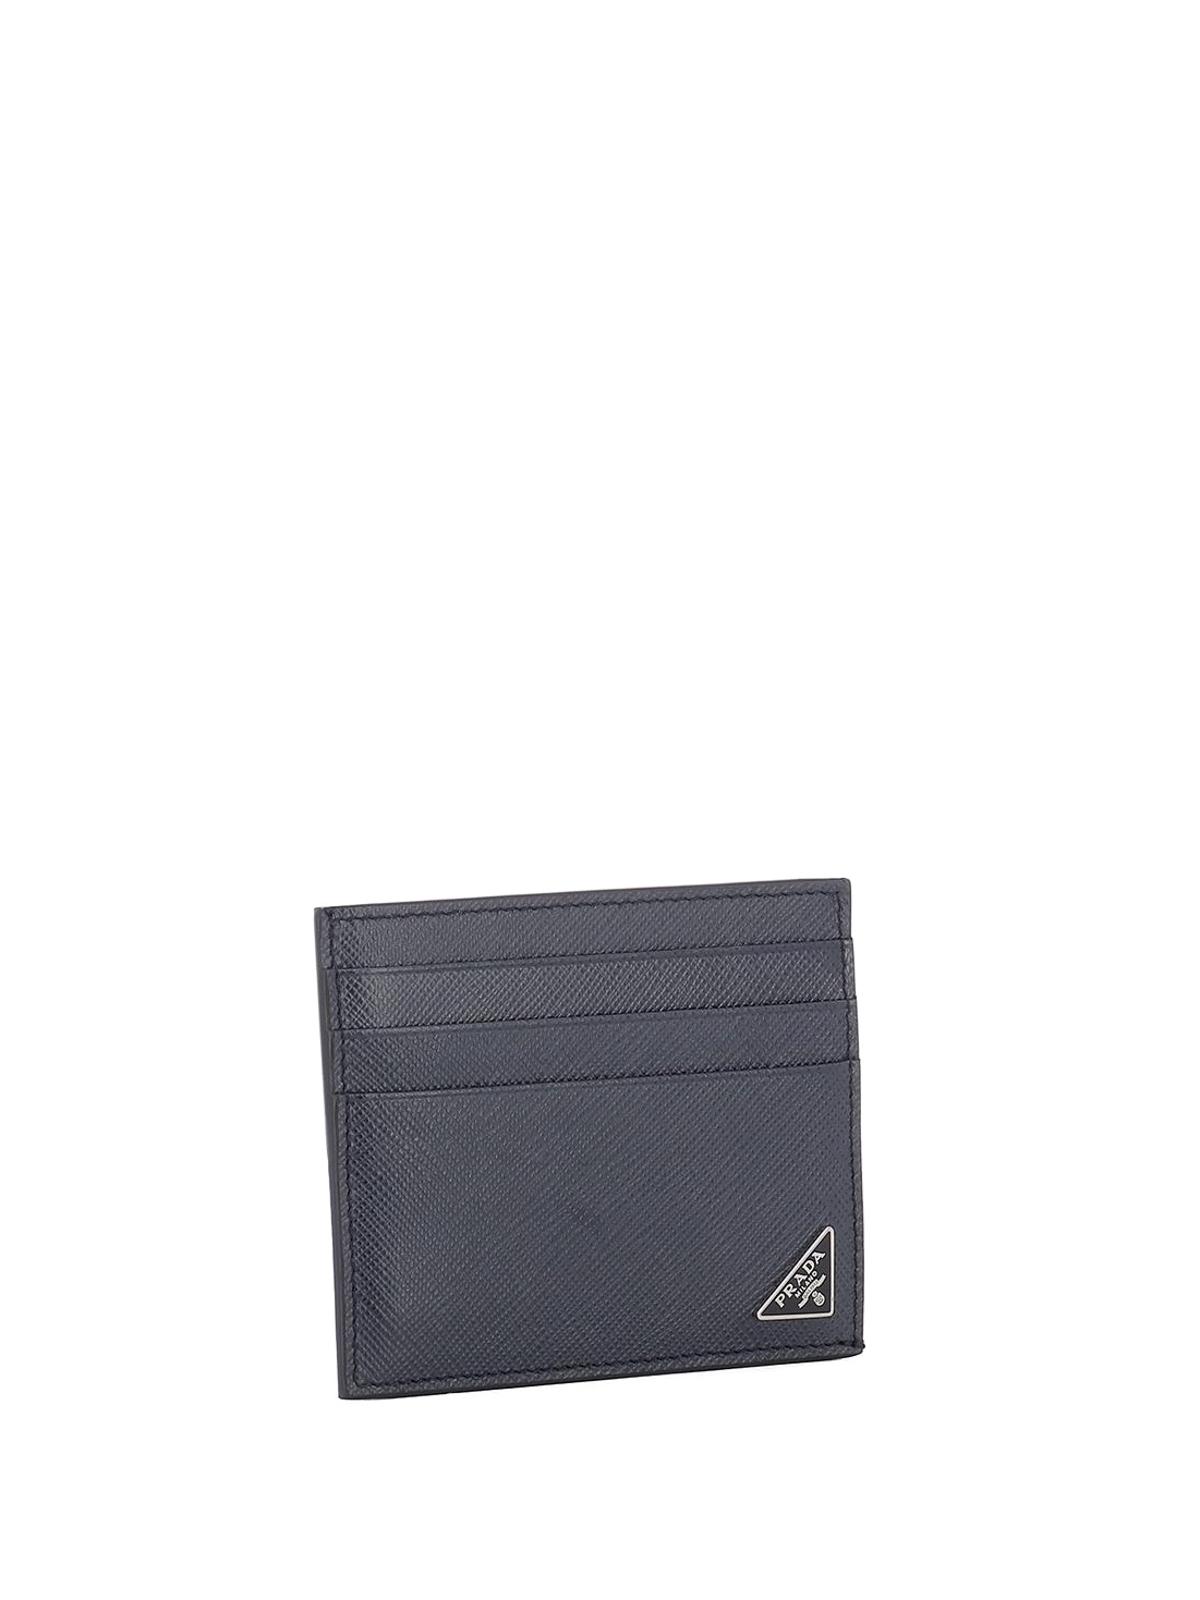 9c81b19c0fe1 PRADA: wallets & purses online - Blue saffiano leather card holder